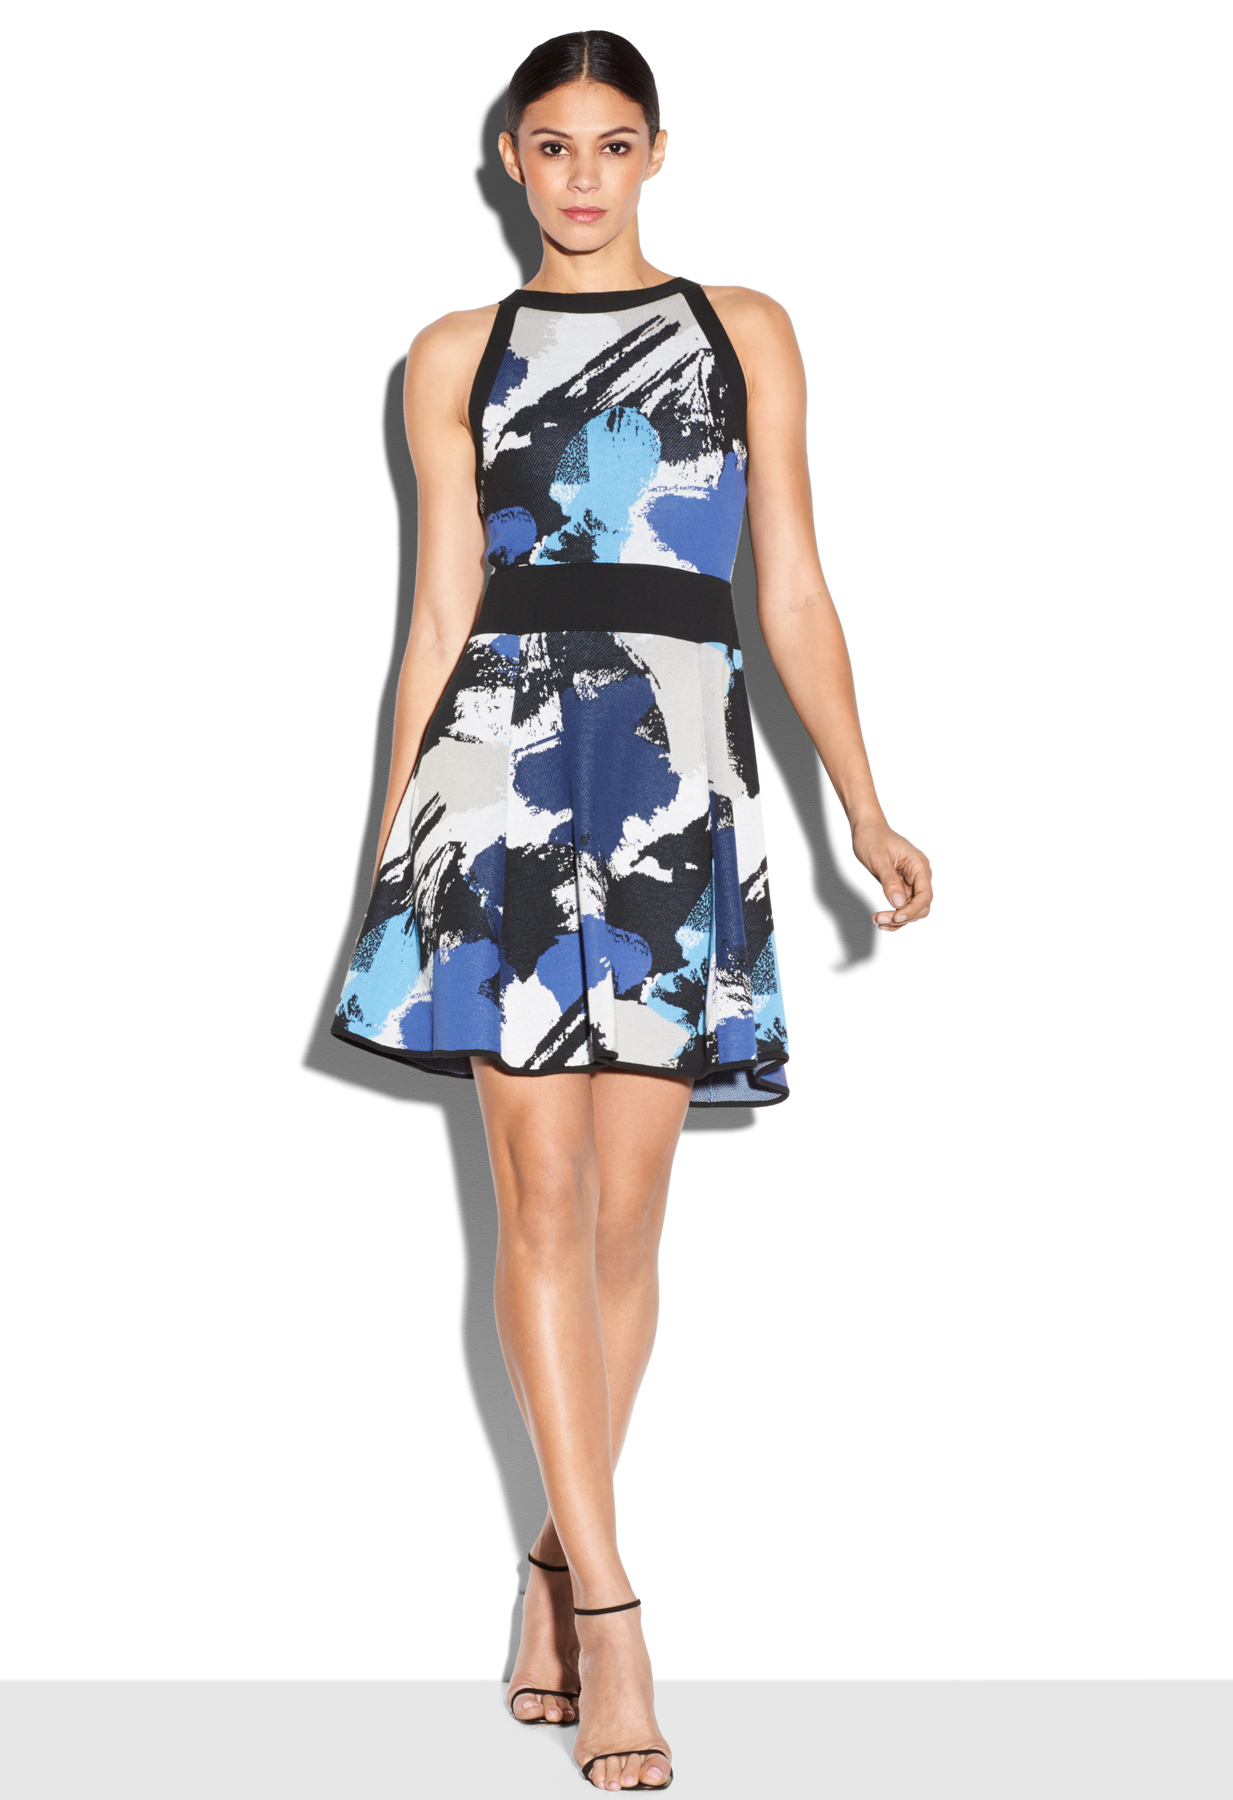 Milly Pop Art Sleeveless Fit Amp Flare Dress Lyst